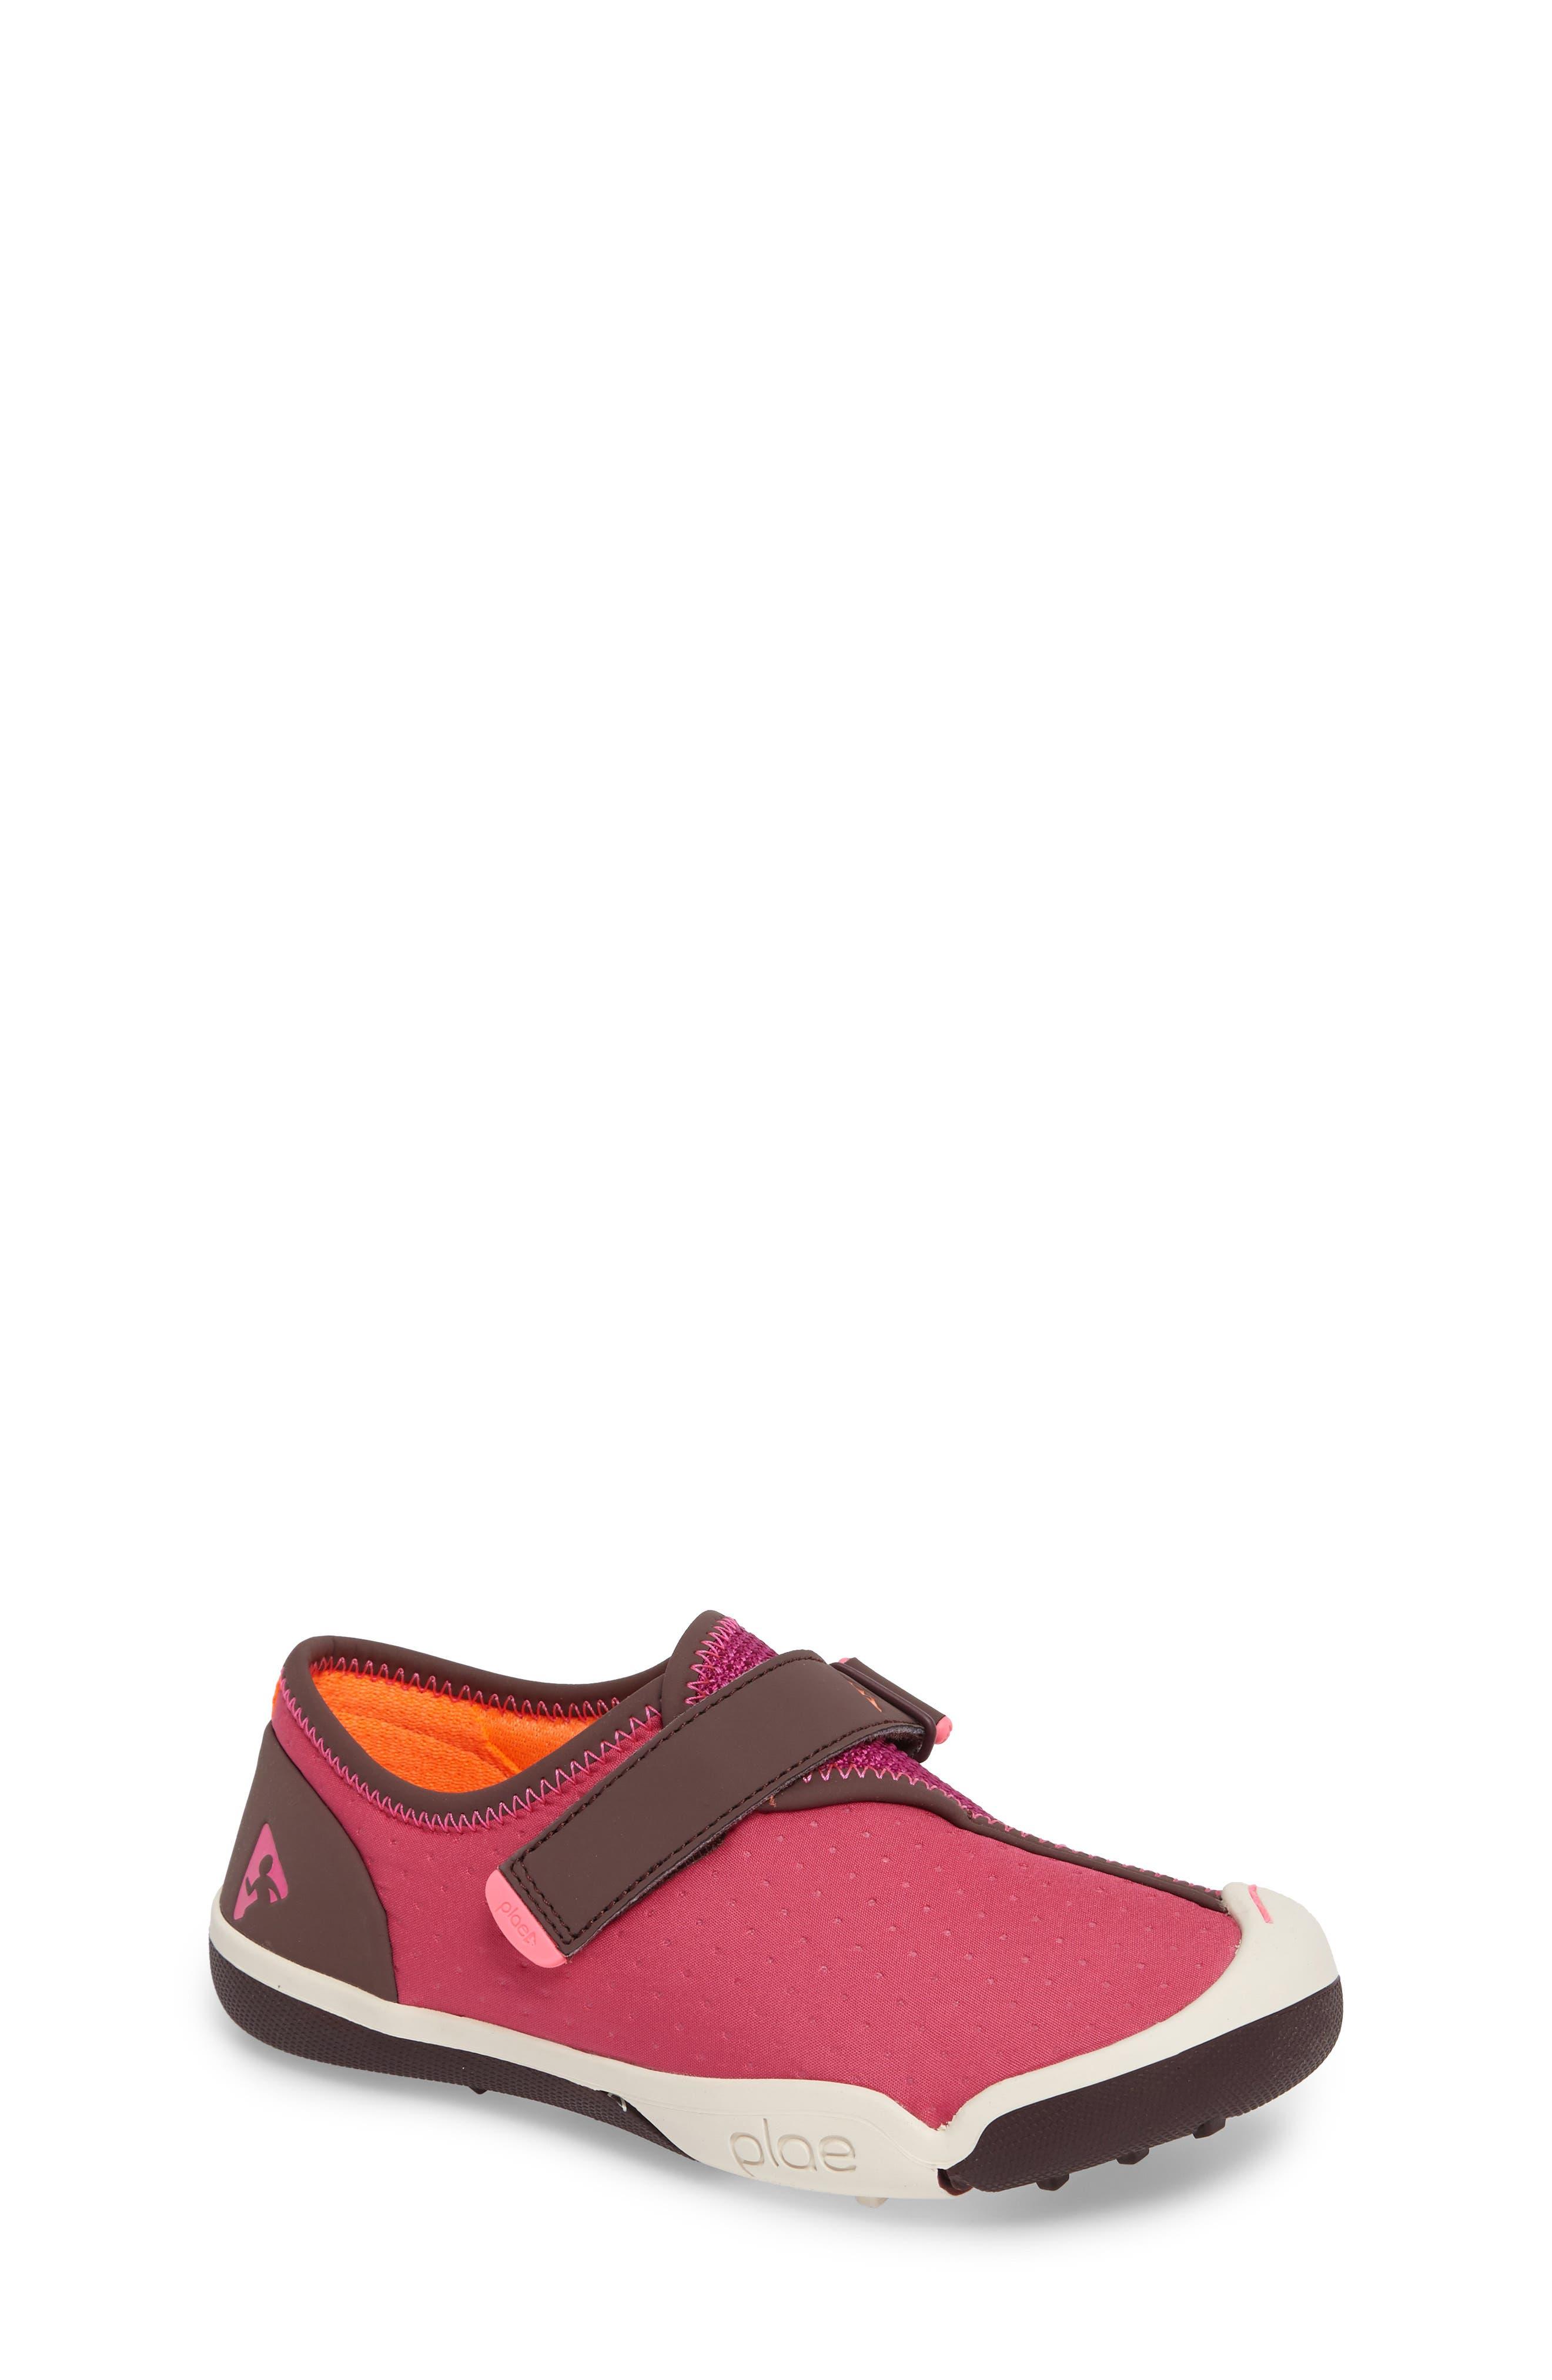 PLAE Cam Sneaker (Toddler, Little Kid & Big Kid)